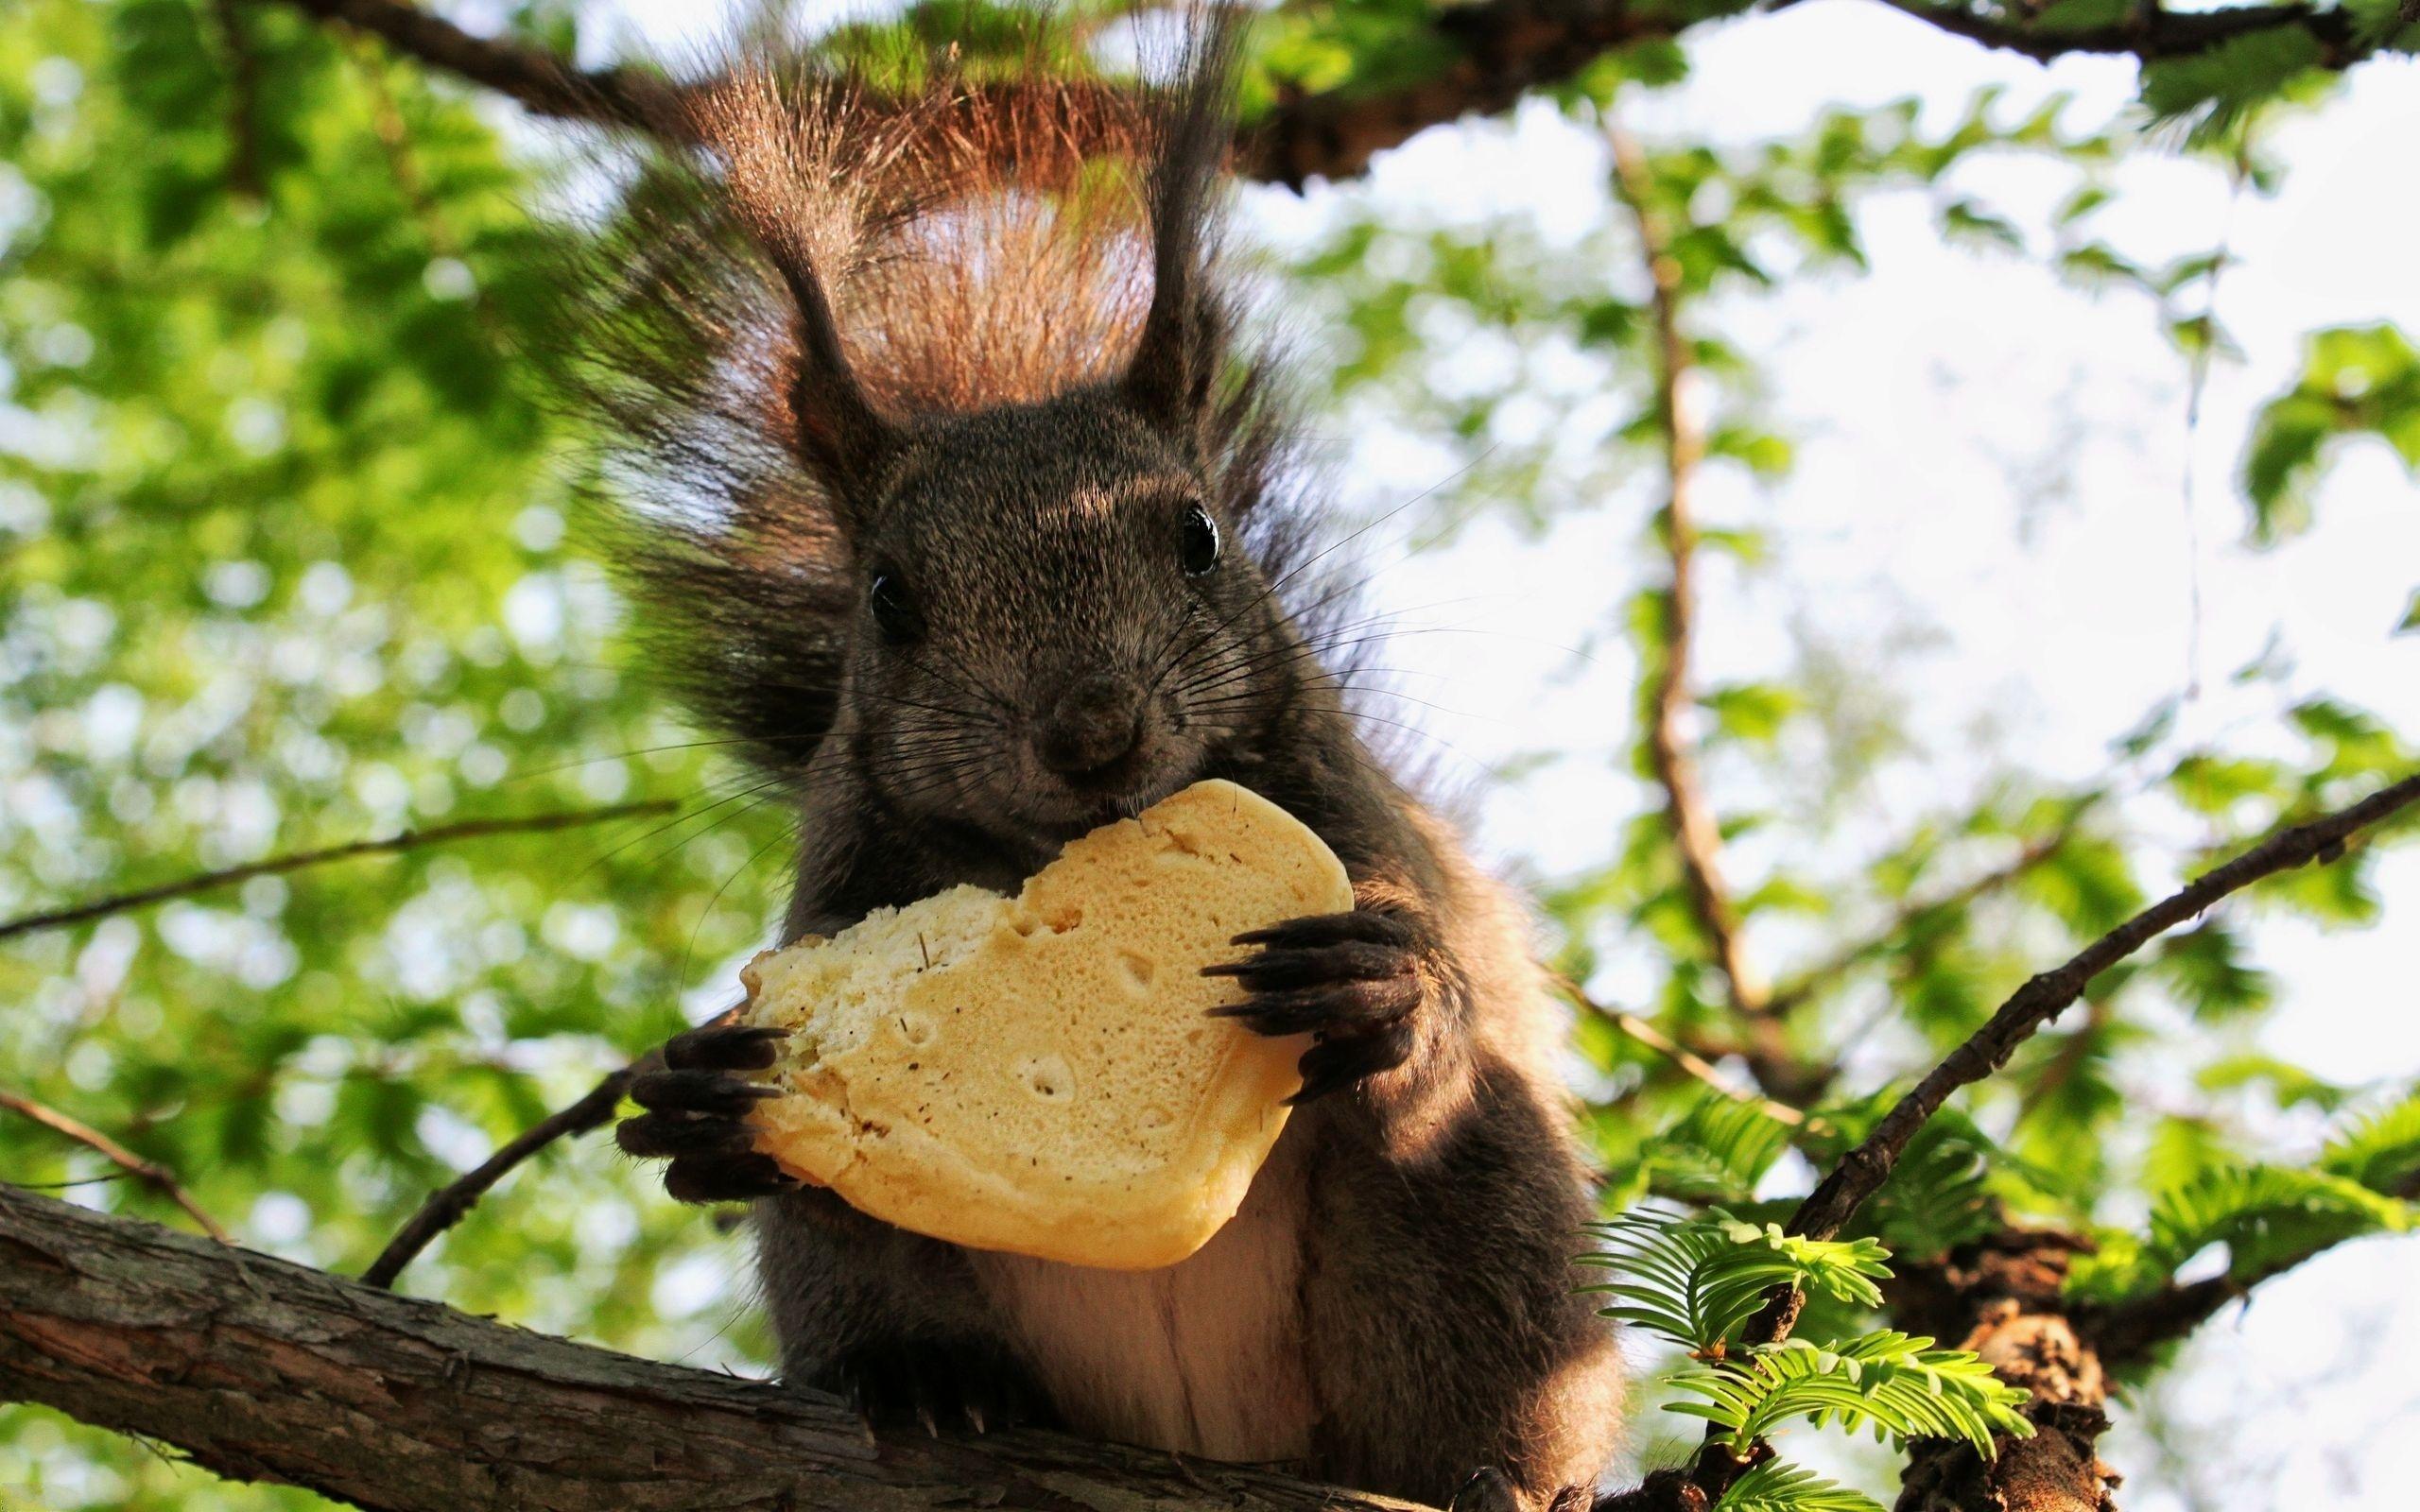 Funny-Squirrel-Eating-Cookie.jpg